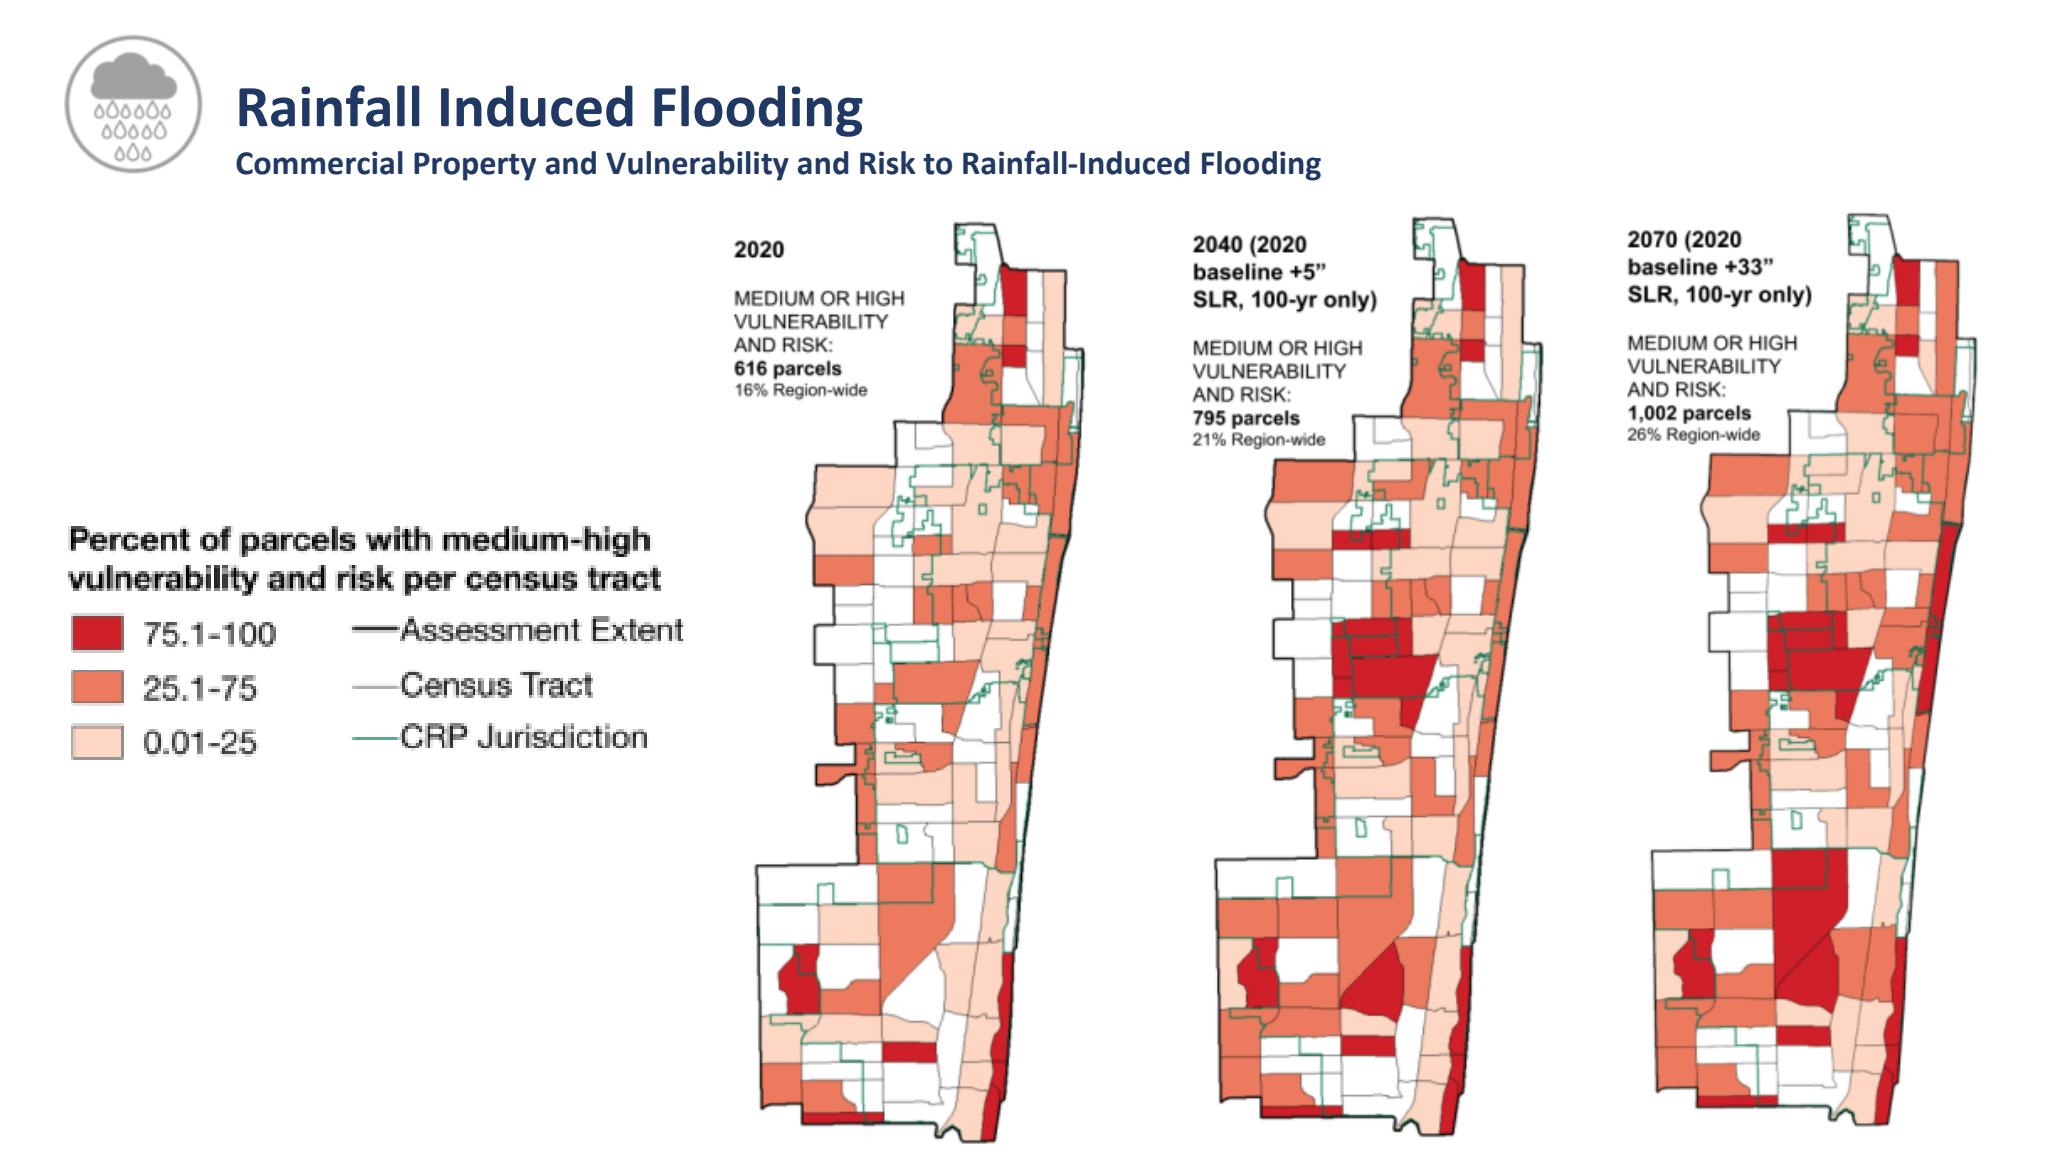 Rainfall Induced Flooding Map